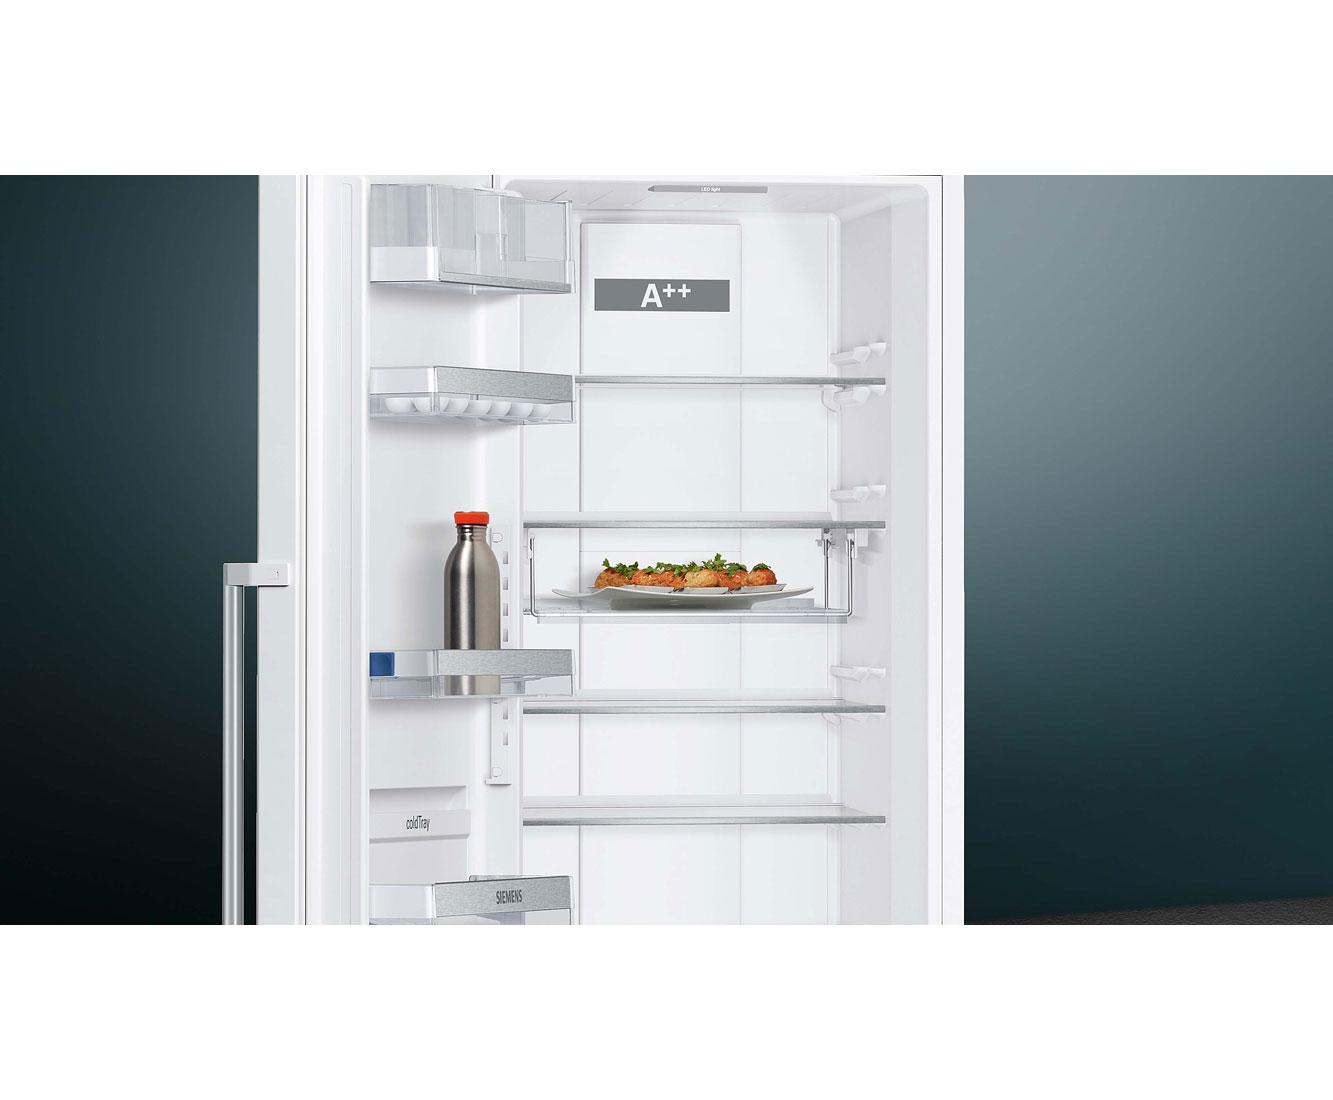 Siemens Kühlschrank Display : Siemens ks vai test kuehlschrank im test